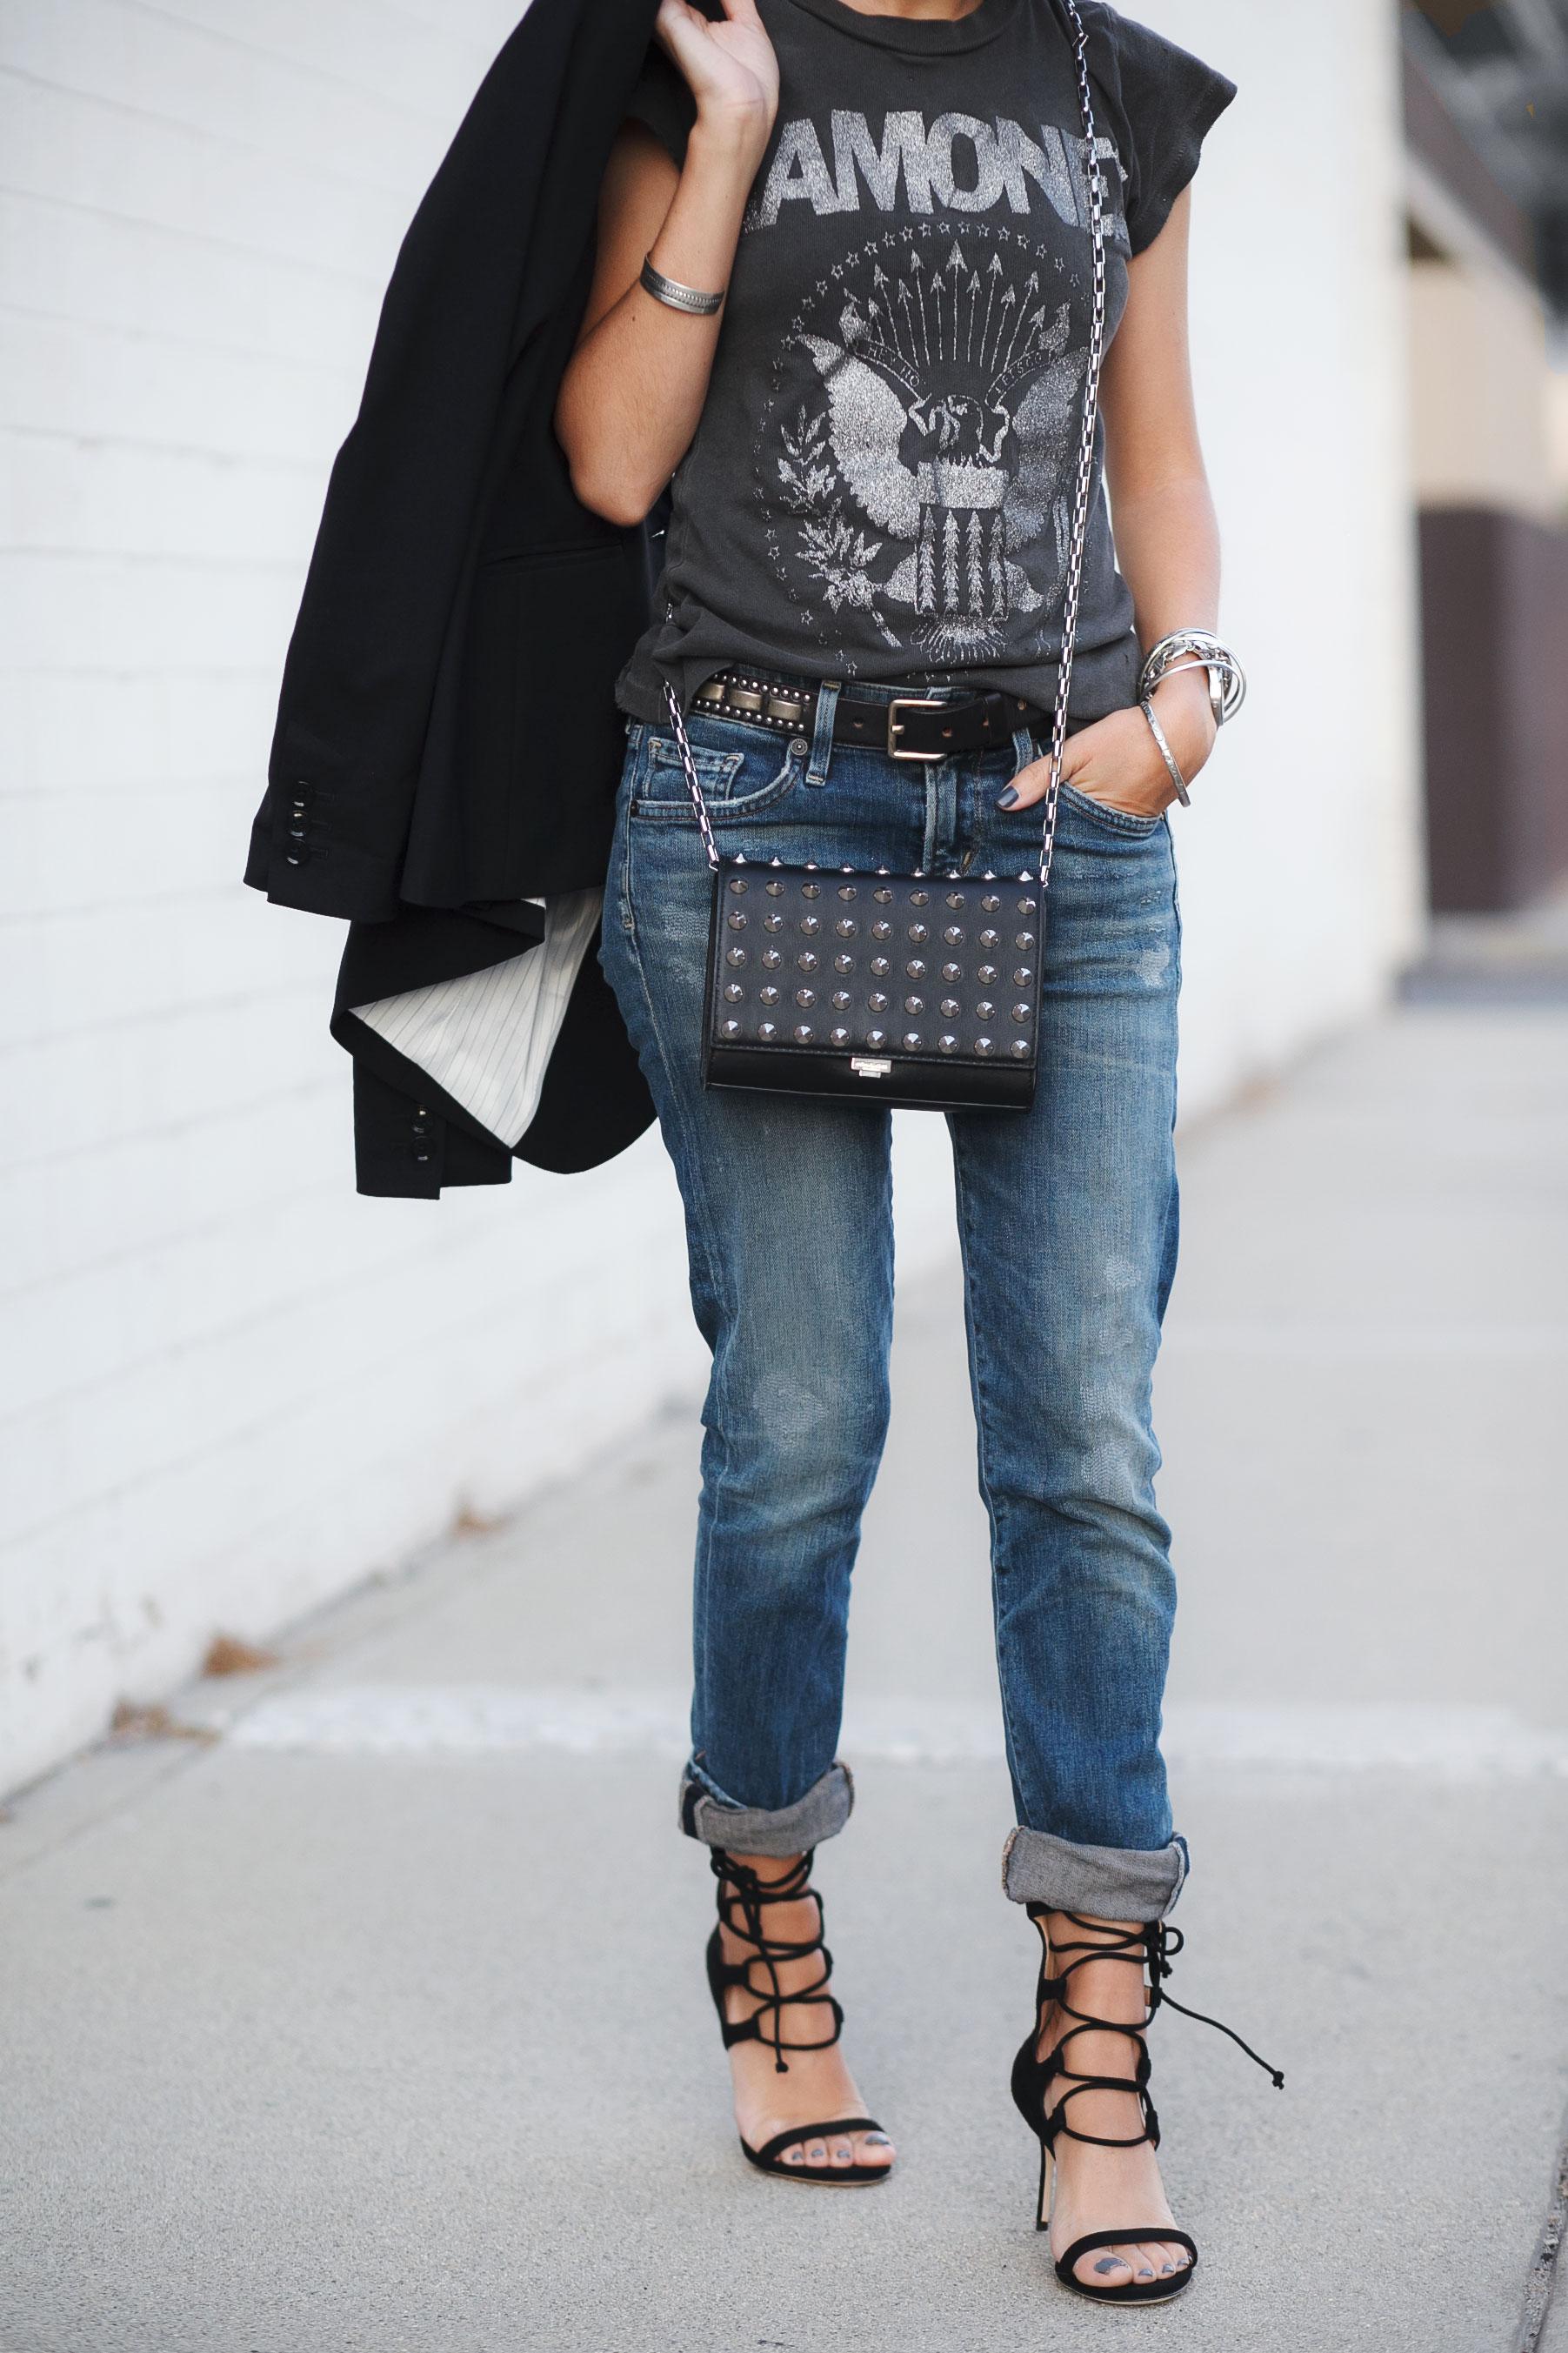 Edgy Sandals + Boyfriend Jeans